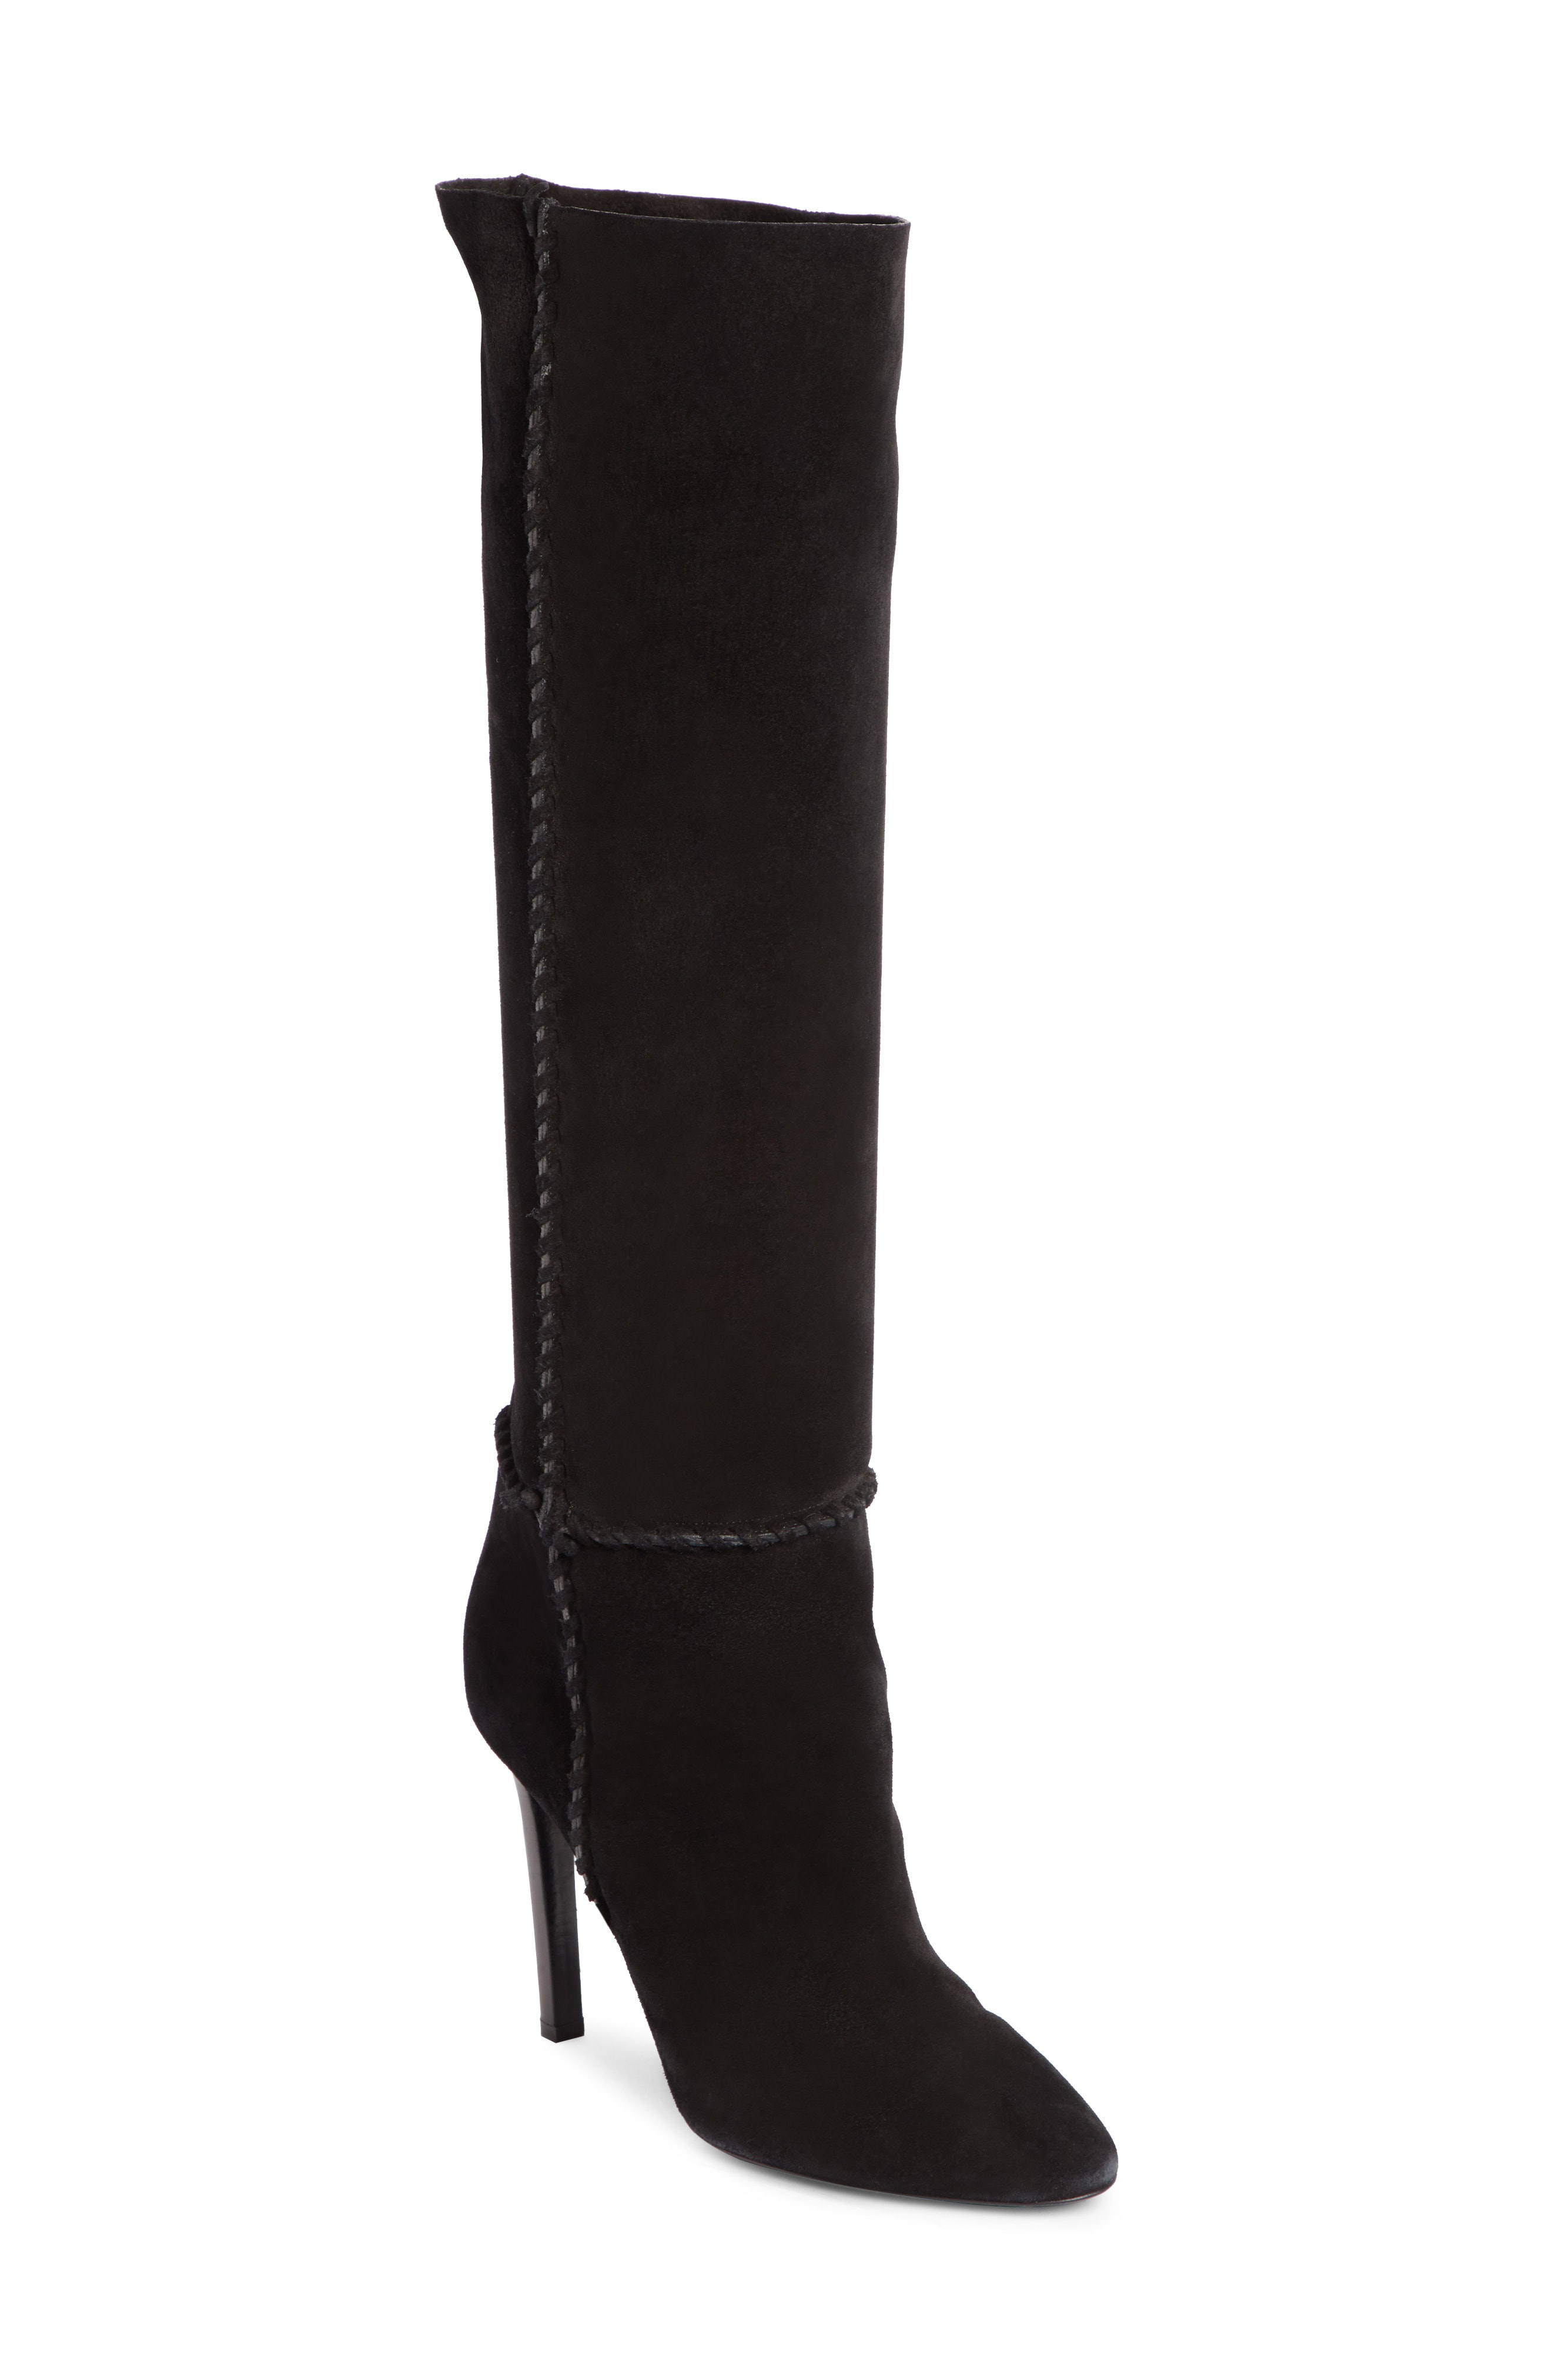 191cbff0c3d Saint Laurent Mica 105 Suede Knee-High Boots In Black | ModeSens